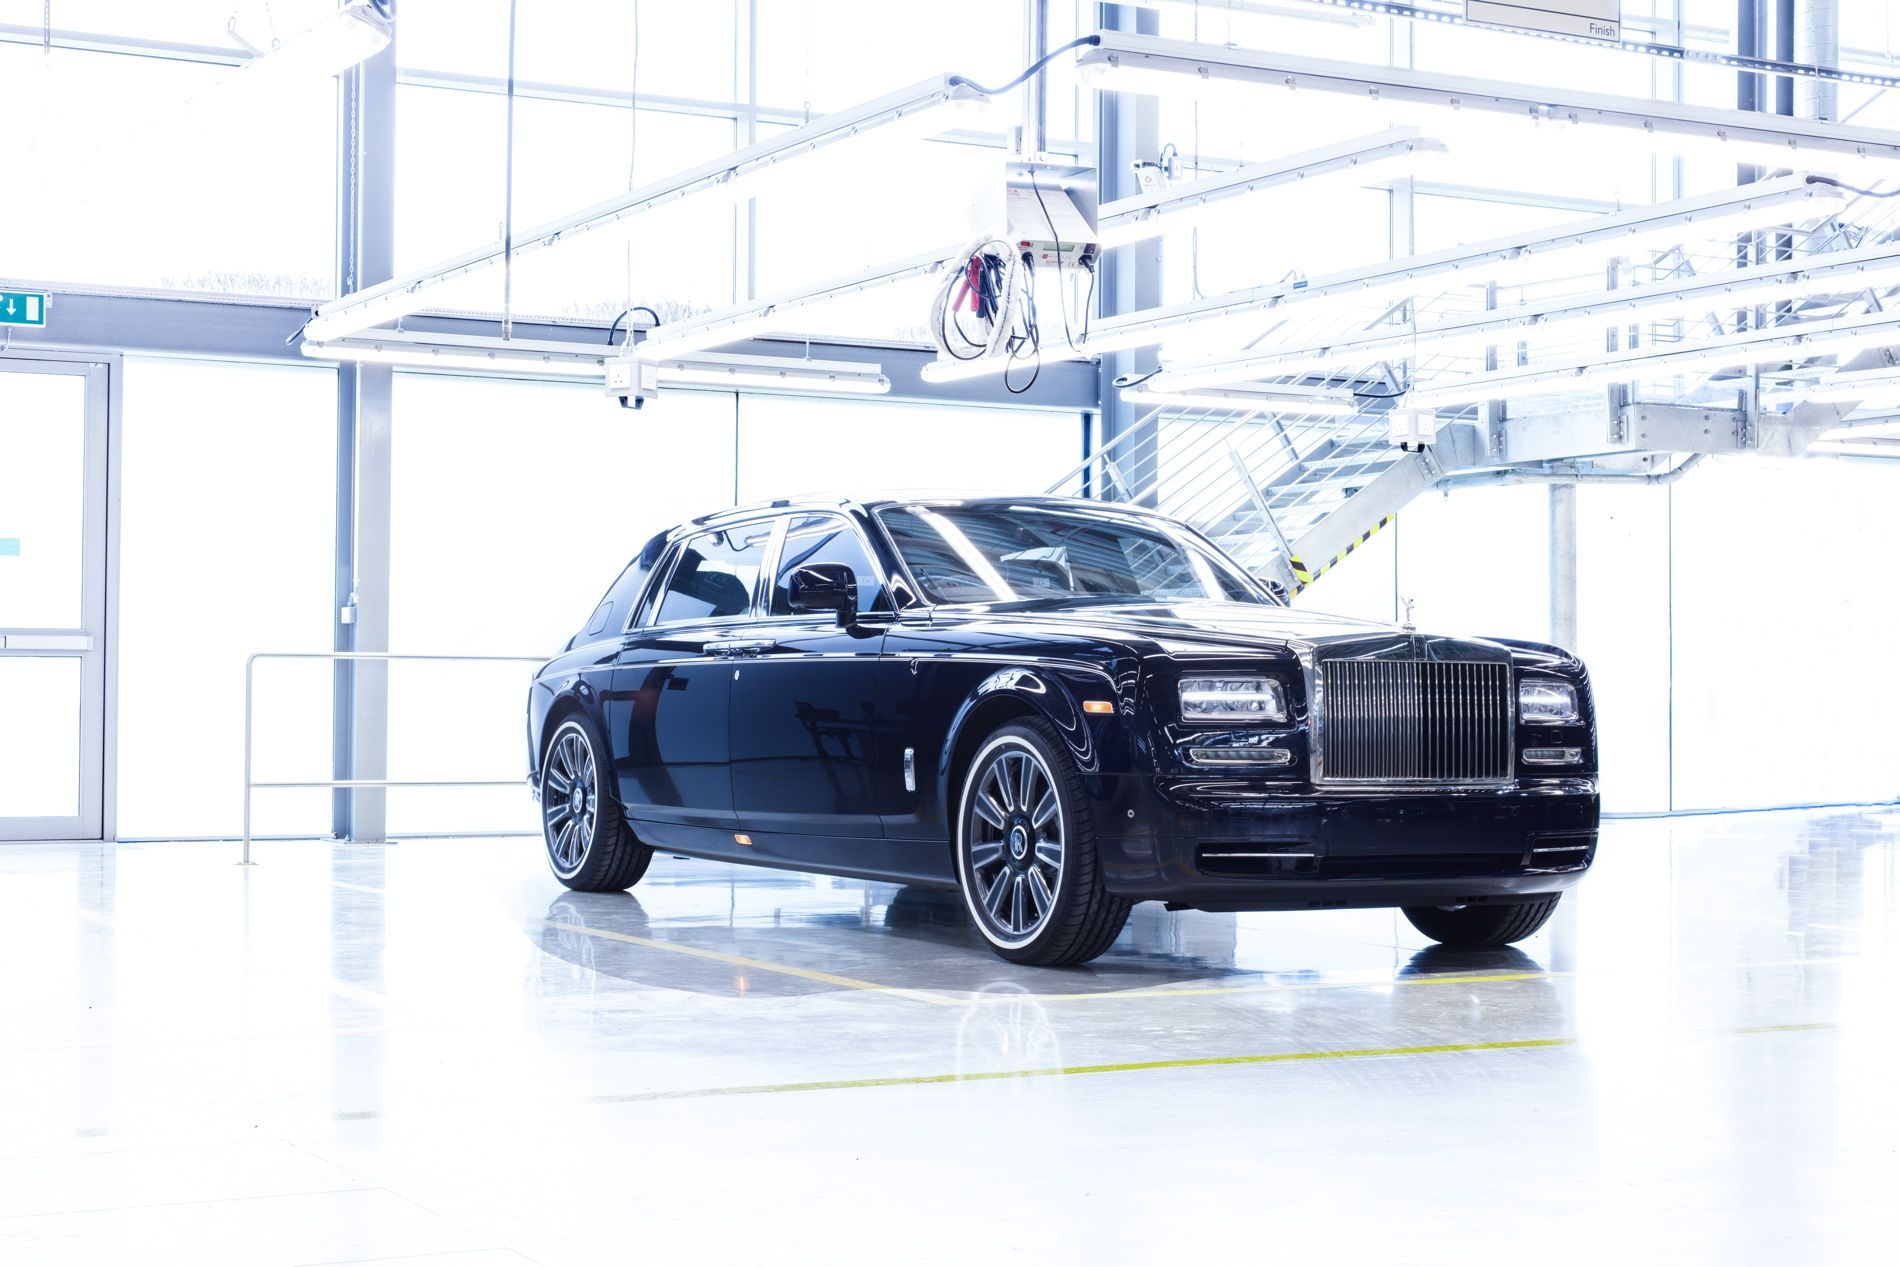 Luxury Vehicle: Pin By Pekka Puhakka On Amazing Cars And Car Technology